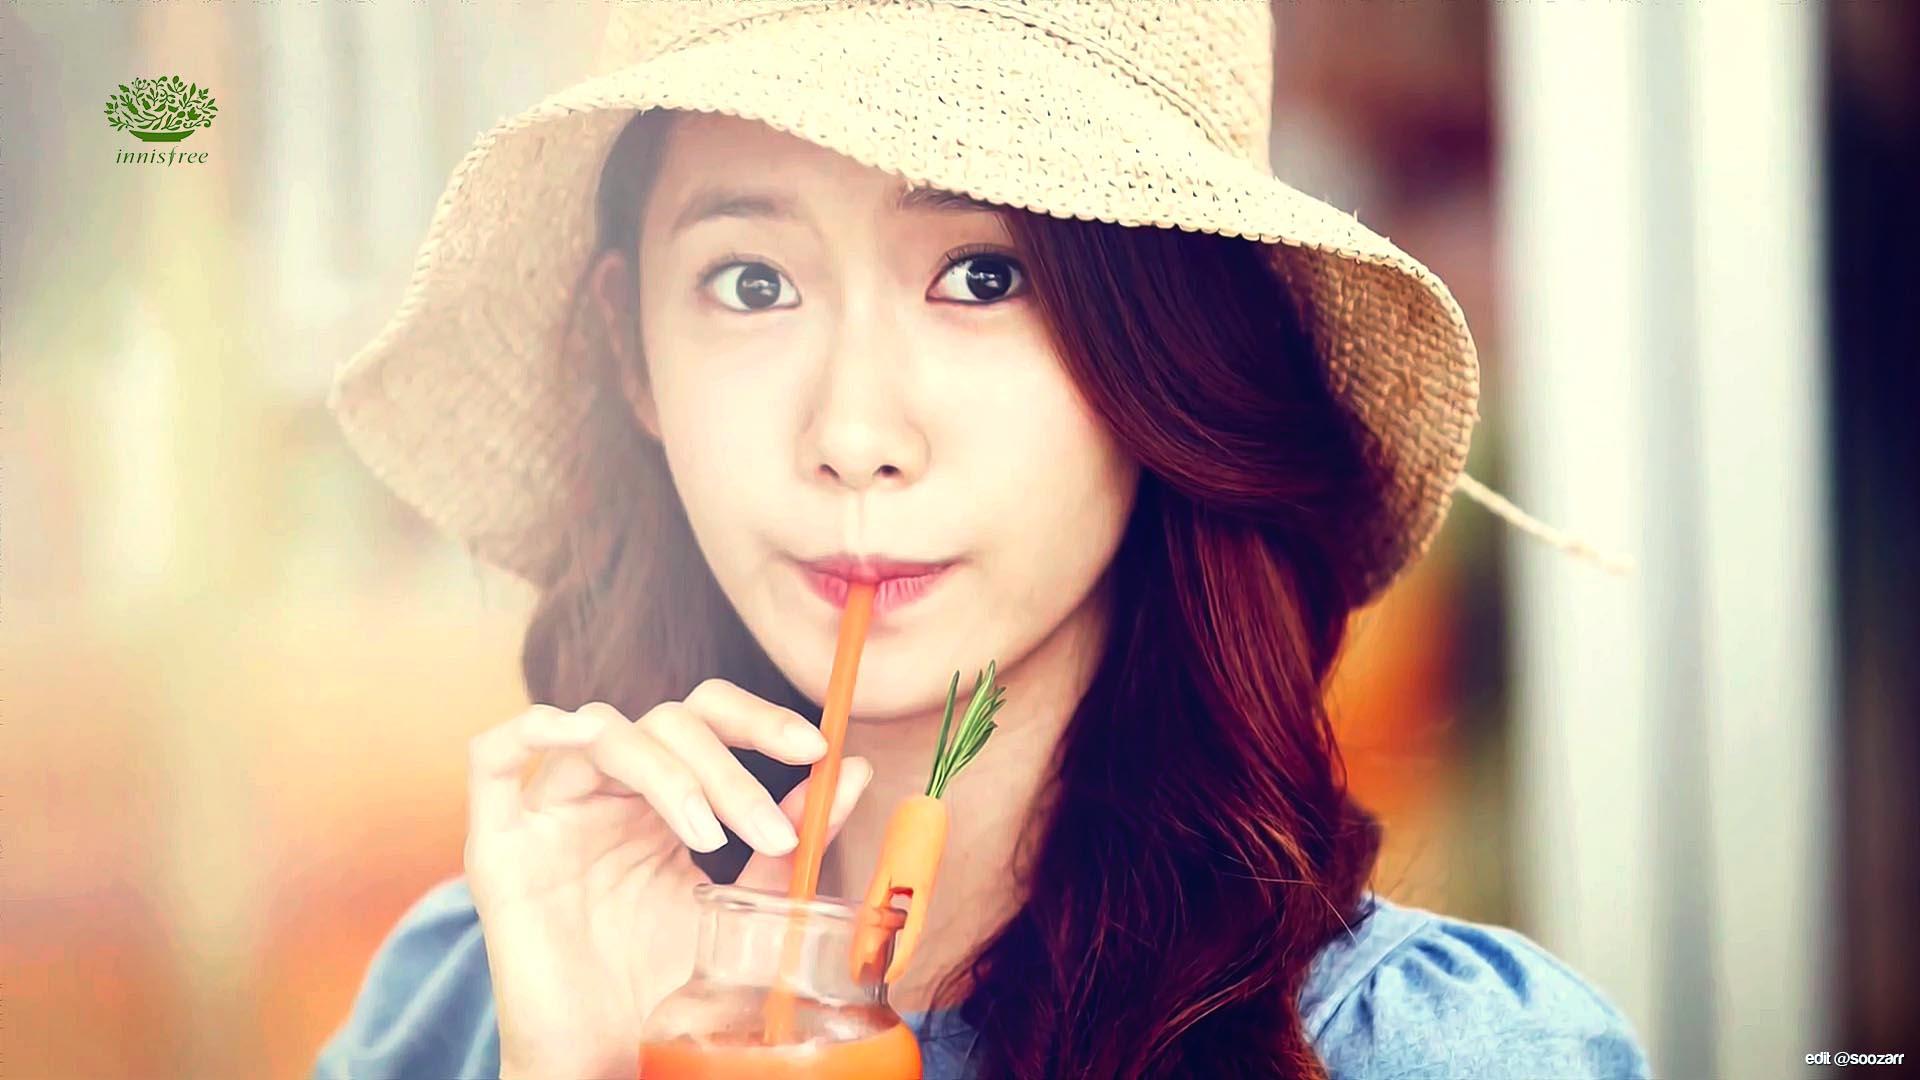 Im Yoona Wallpaper Iphone free desktop backgrounds and wallpapers